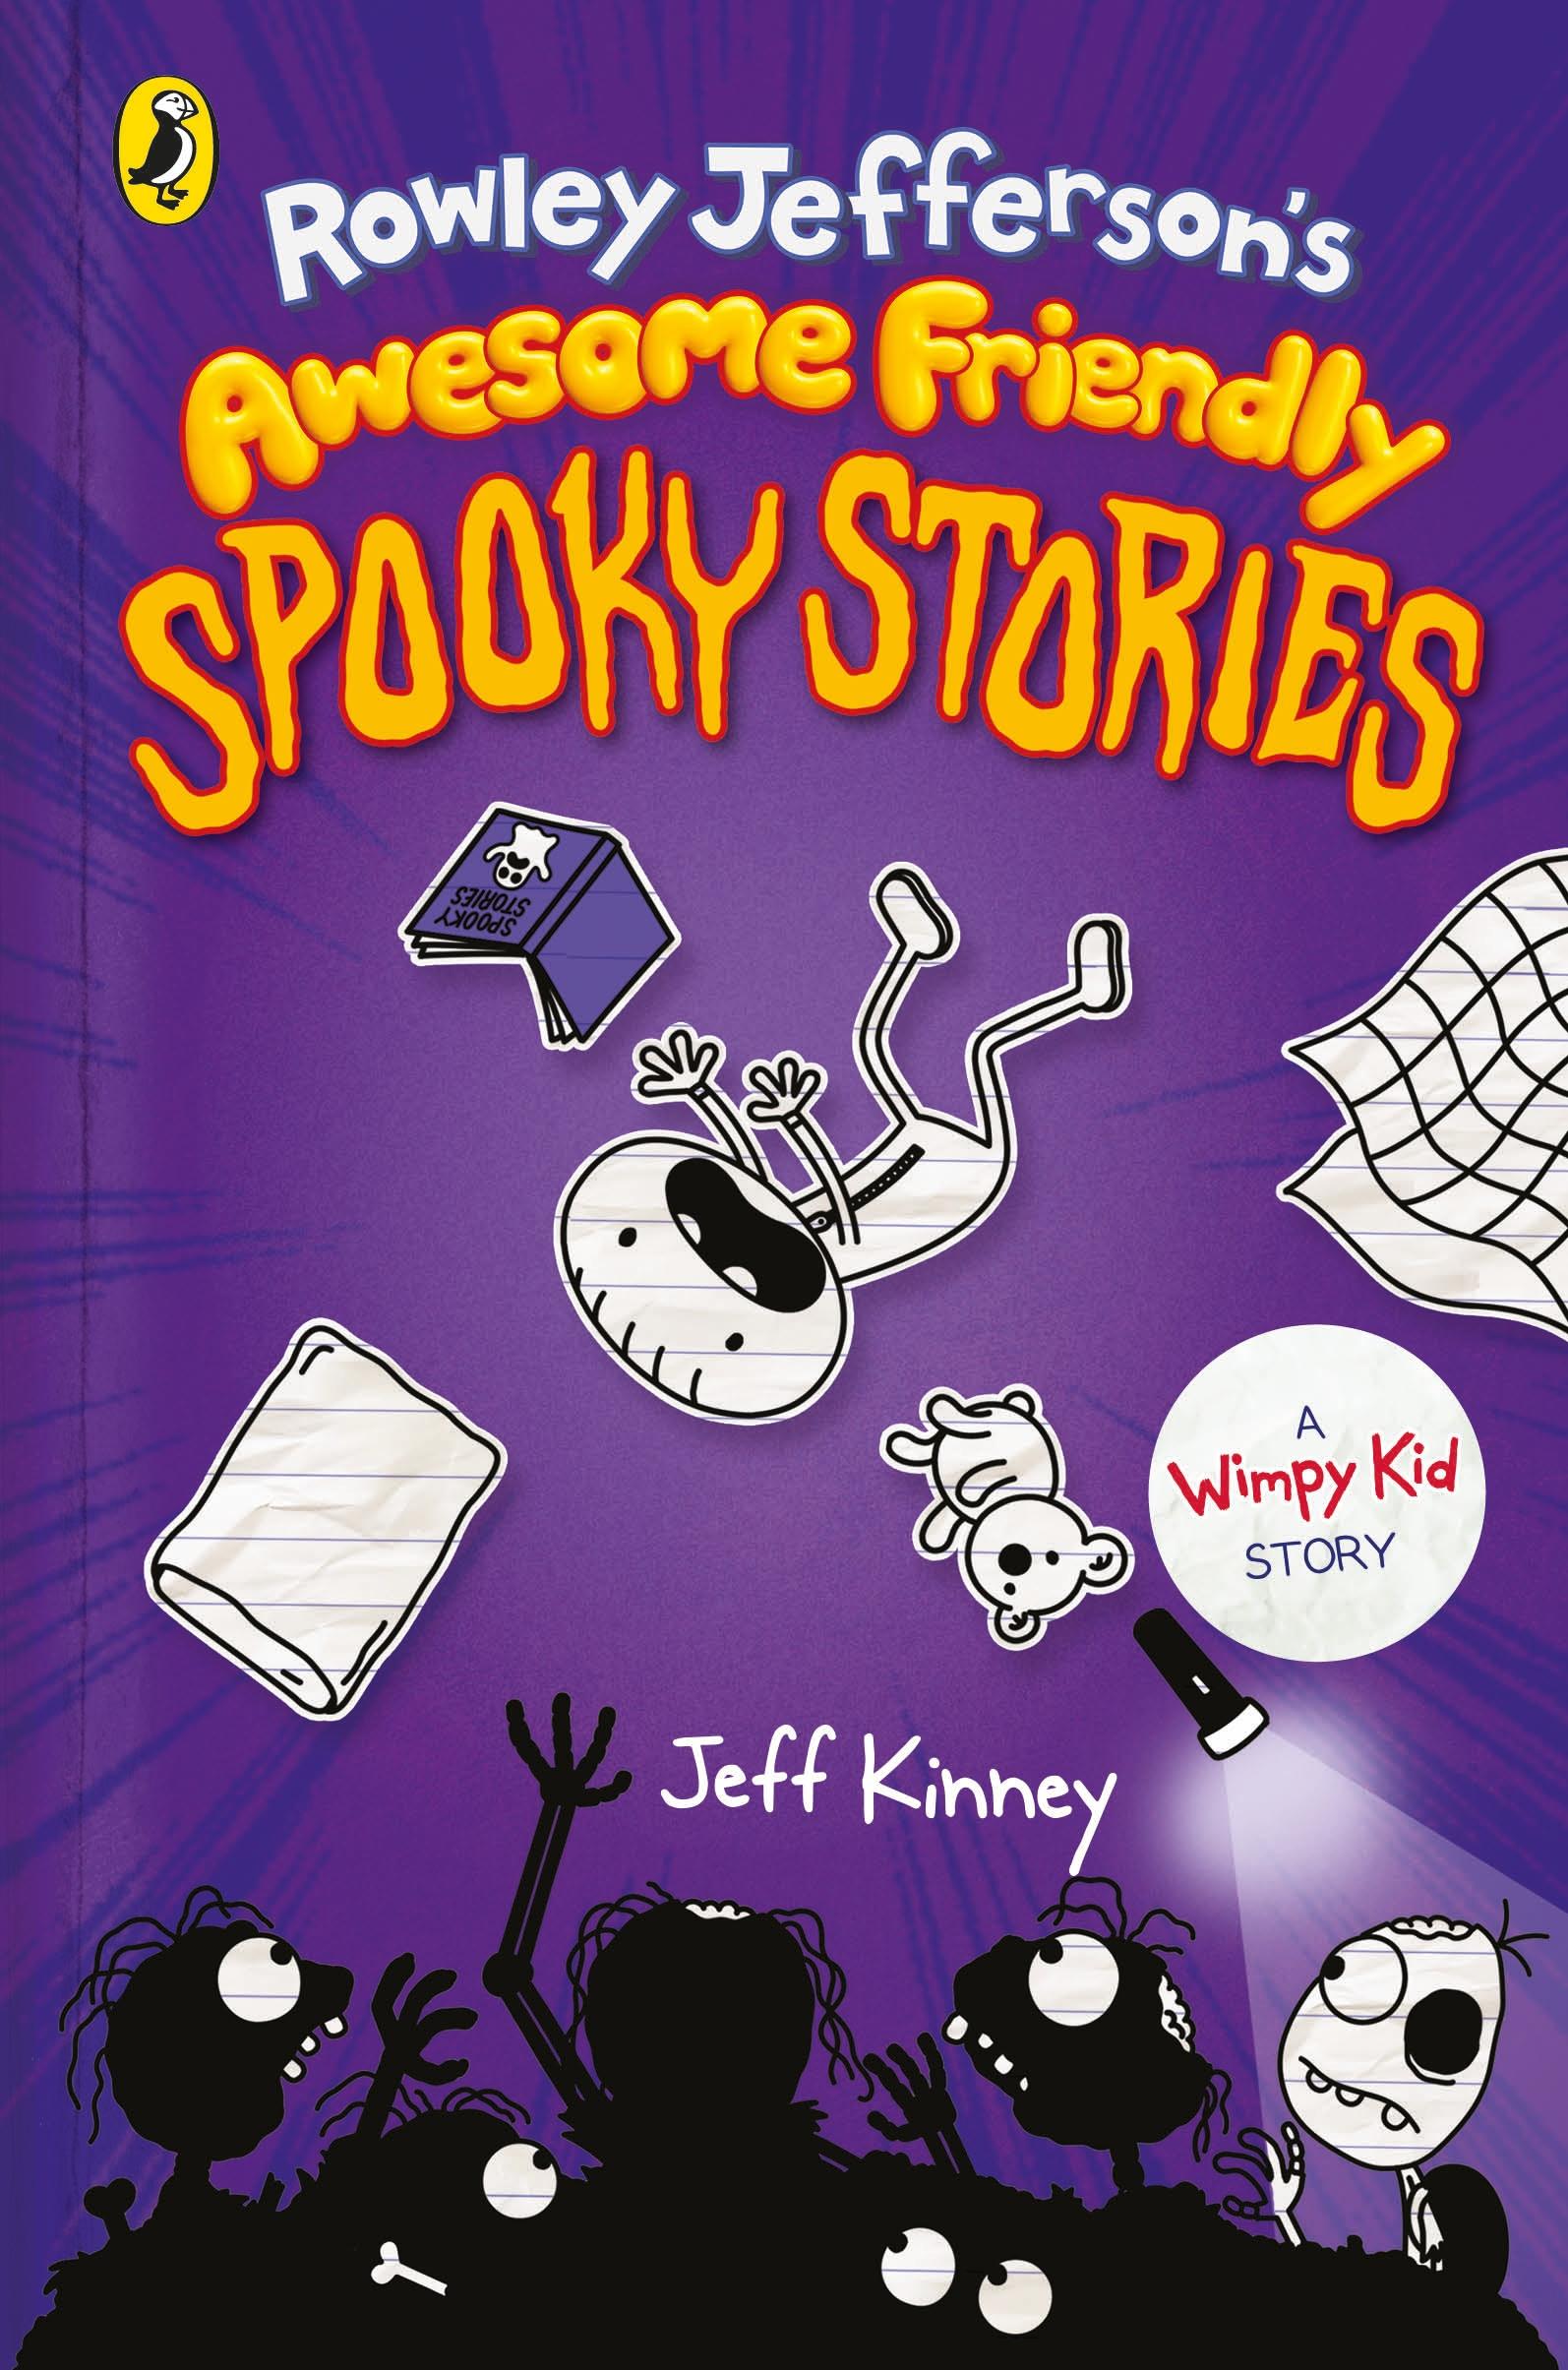 Rowley Jefferson's Awesome Friendly Spooky Stories - 9780241530399